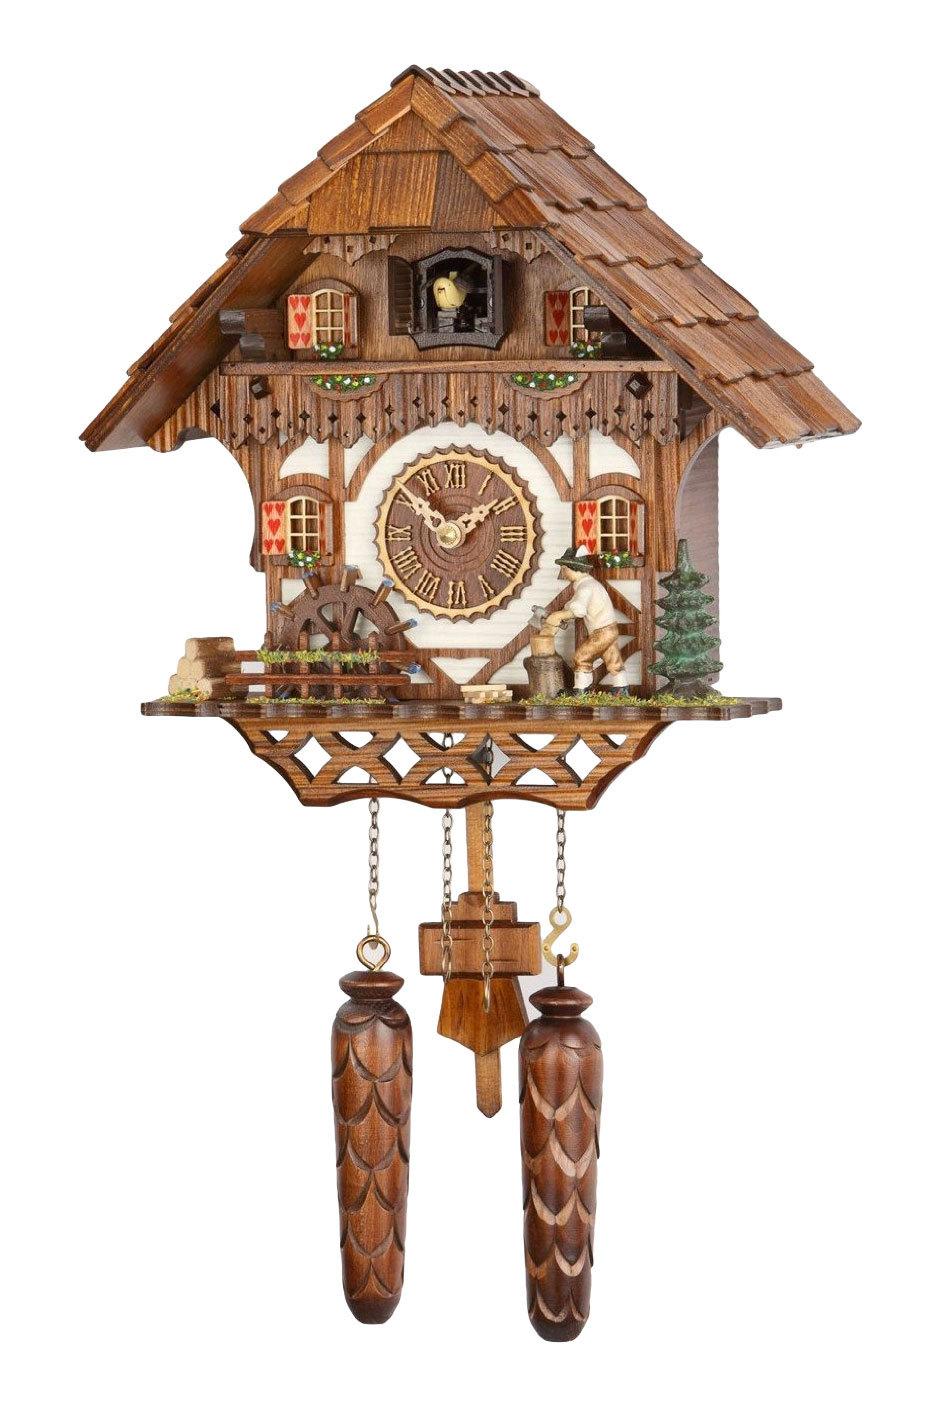 Часы настенные Часы настенные с кукушкой Trenkle 468 QM HZZG chasy-nastennye-s-kukushkoy-trenkle-468-qm-hzzg-germaniya.jpg